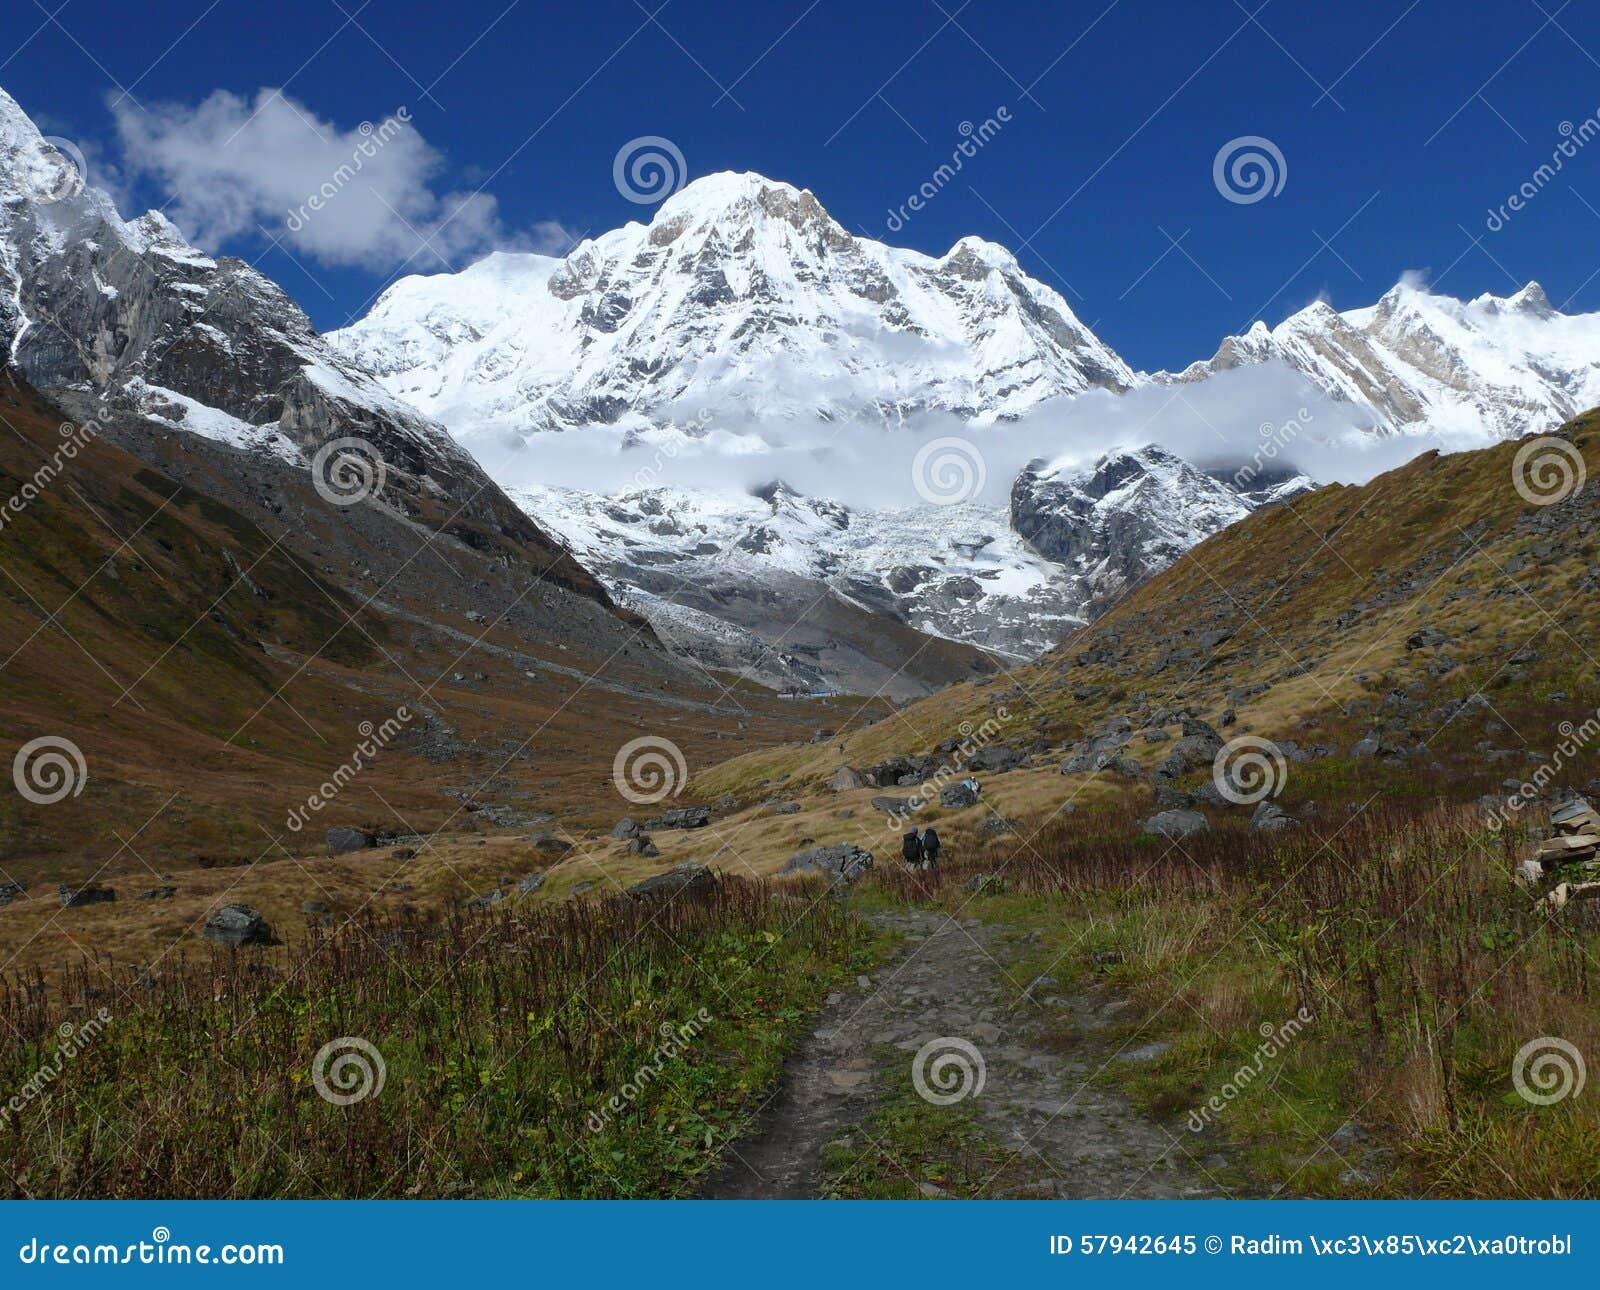 Download Way to Annapurna Base Camp stock image. Image of annapurna - 57942645